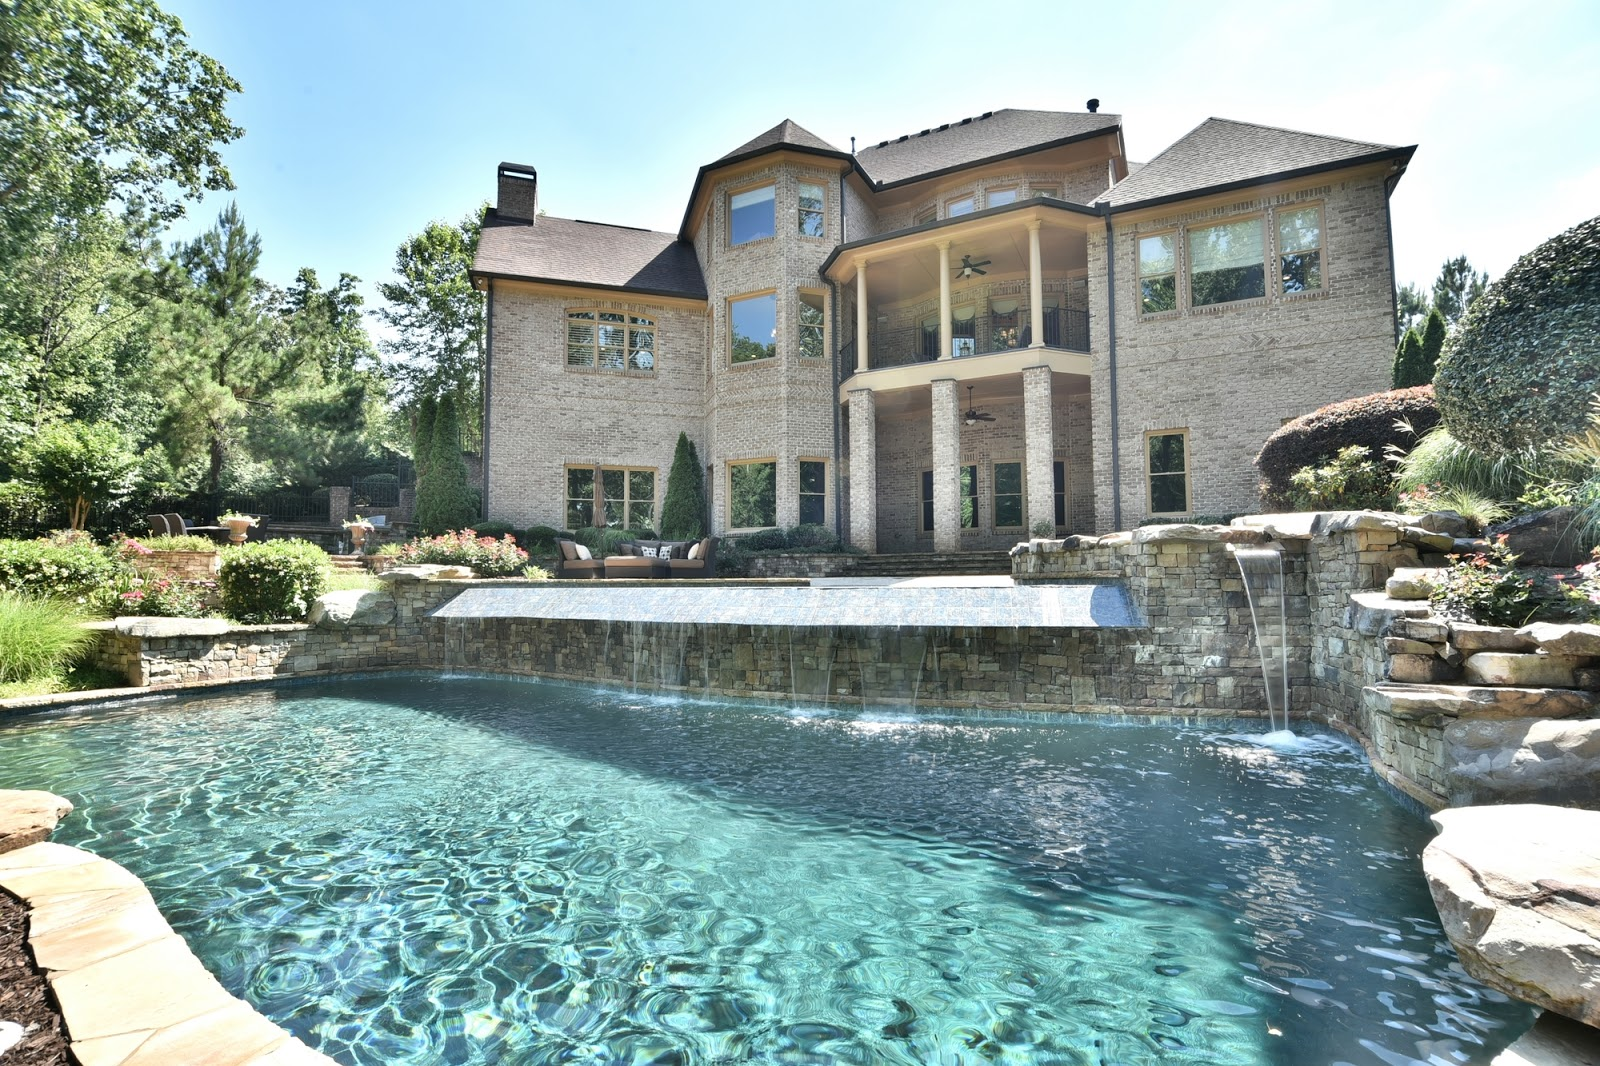 Luxury Cumming Georgia Home On 3 Acres